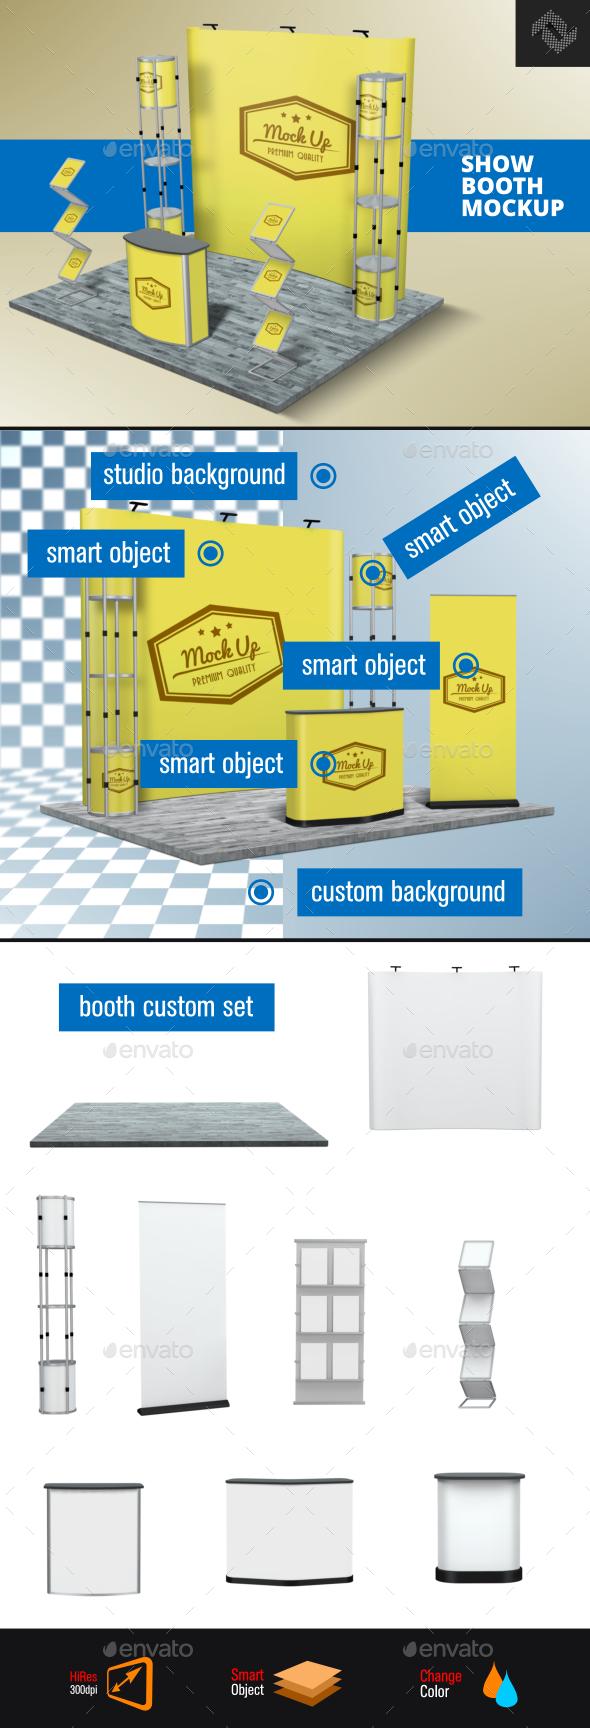 Trade Show Booth Mockup - Product Mock-Ups Graphics